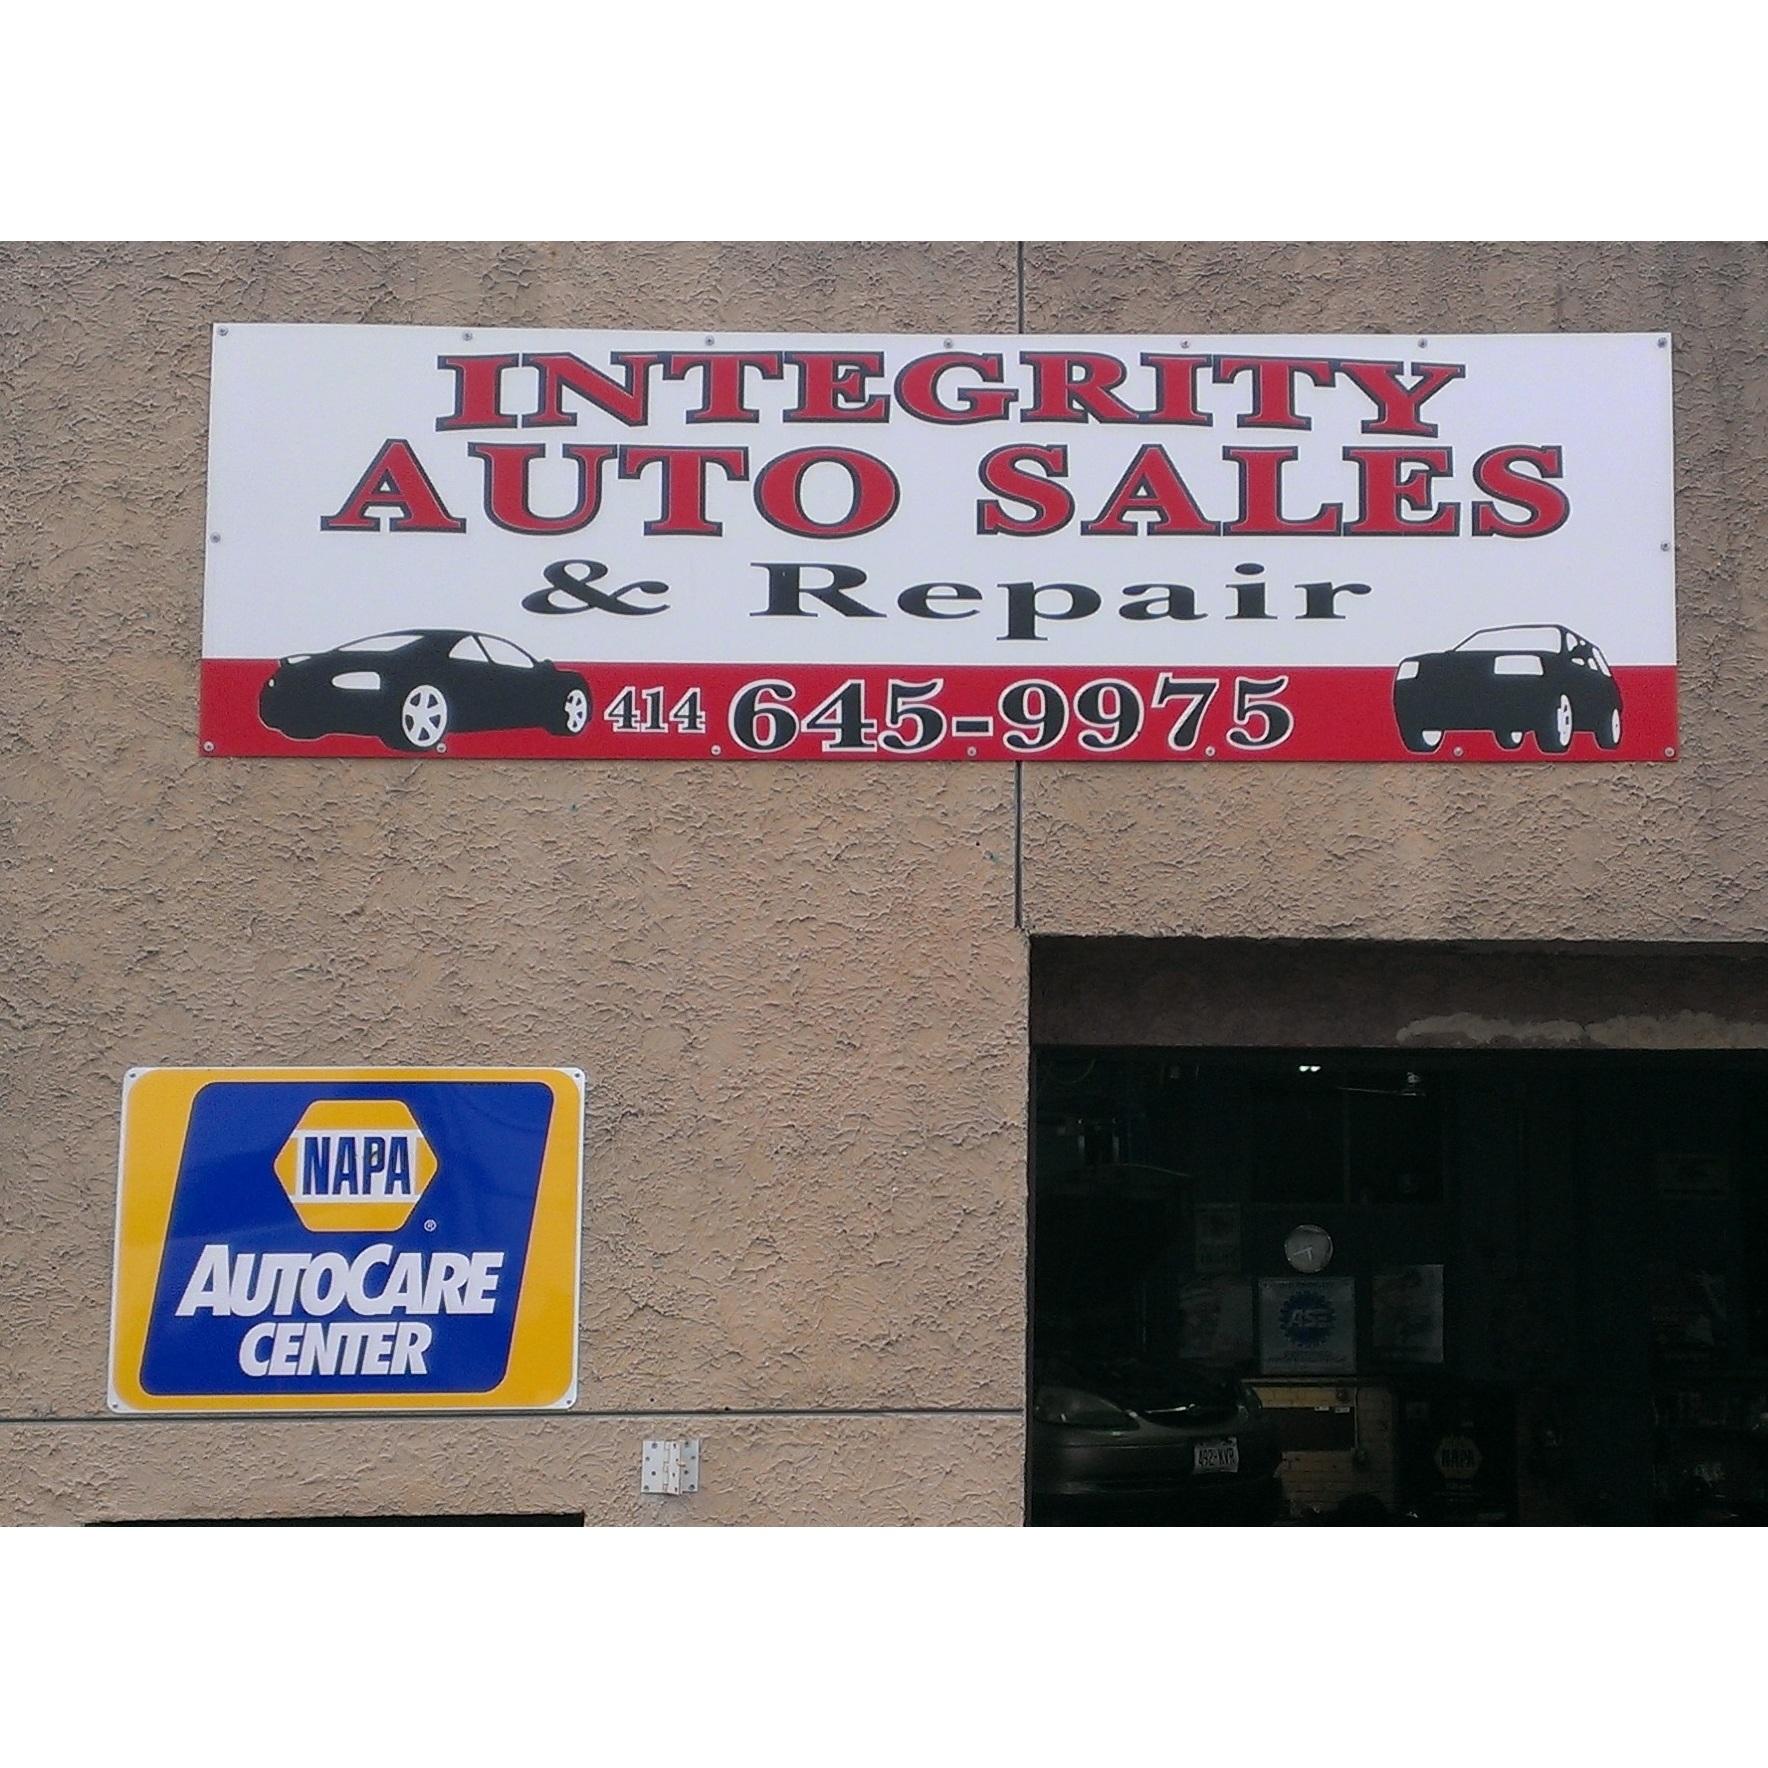 Auto Repair in WI Milwaukee 53204 Integrity Auto Sales & Repair 111 E. Mineral St.  (414)645-9975